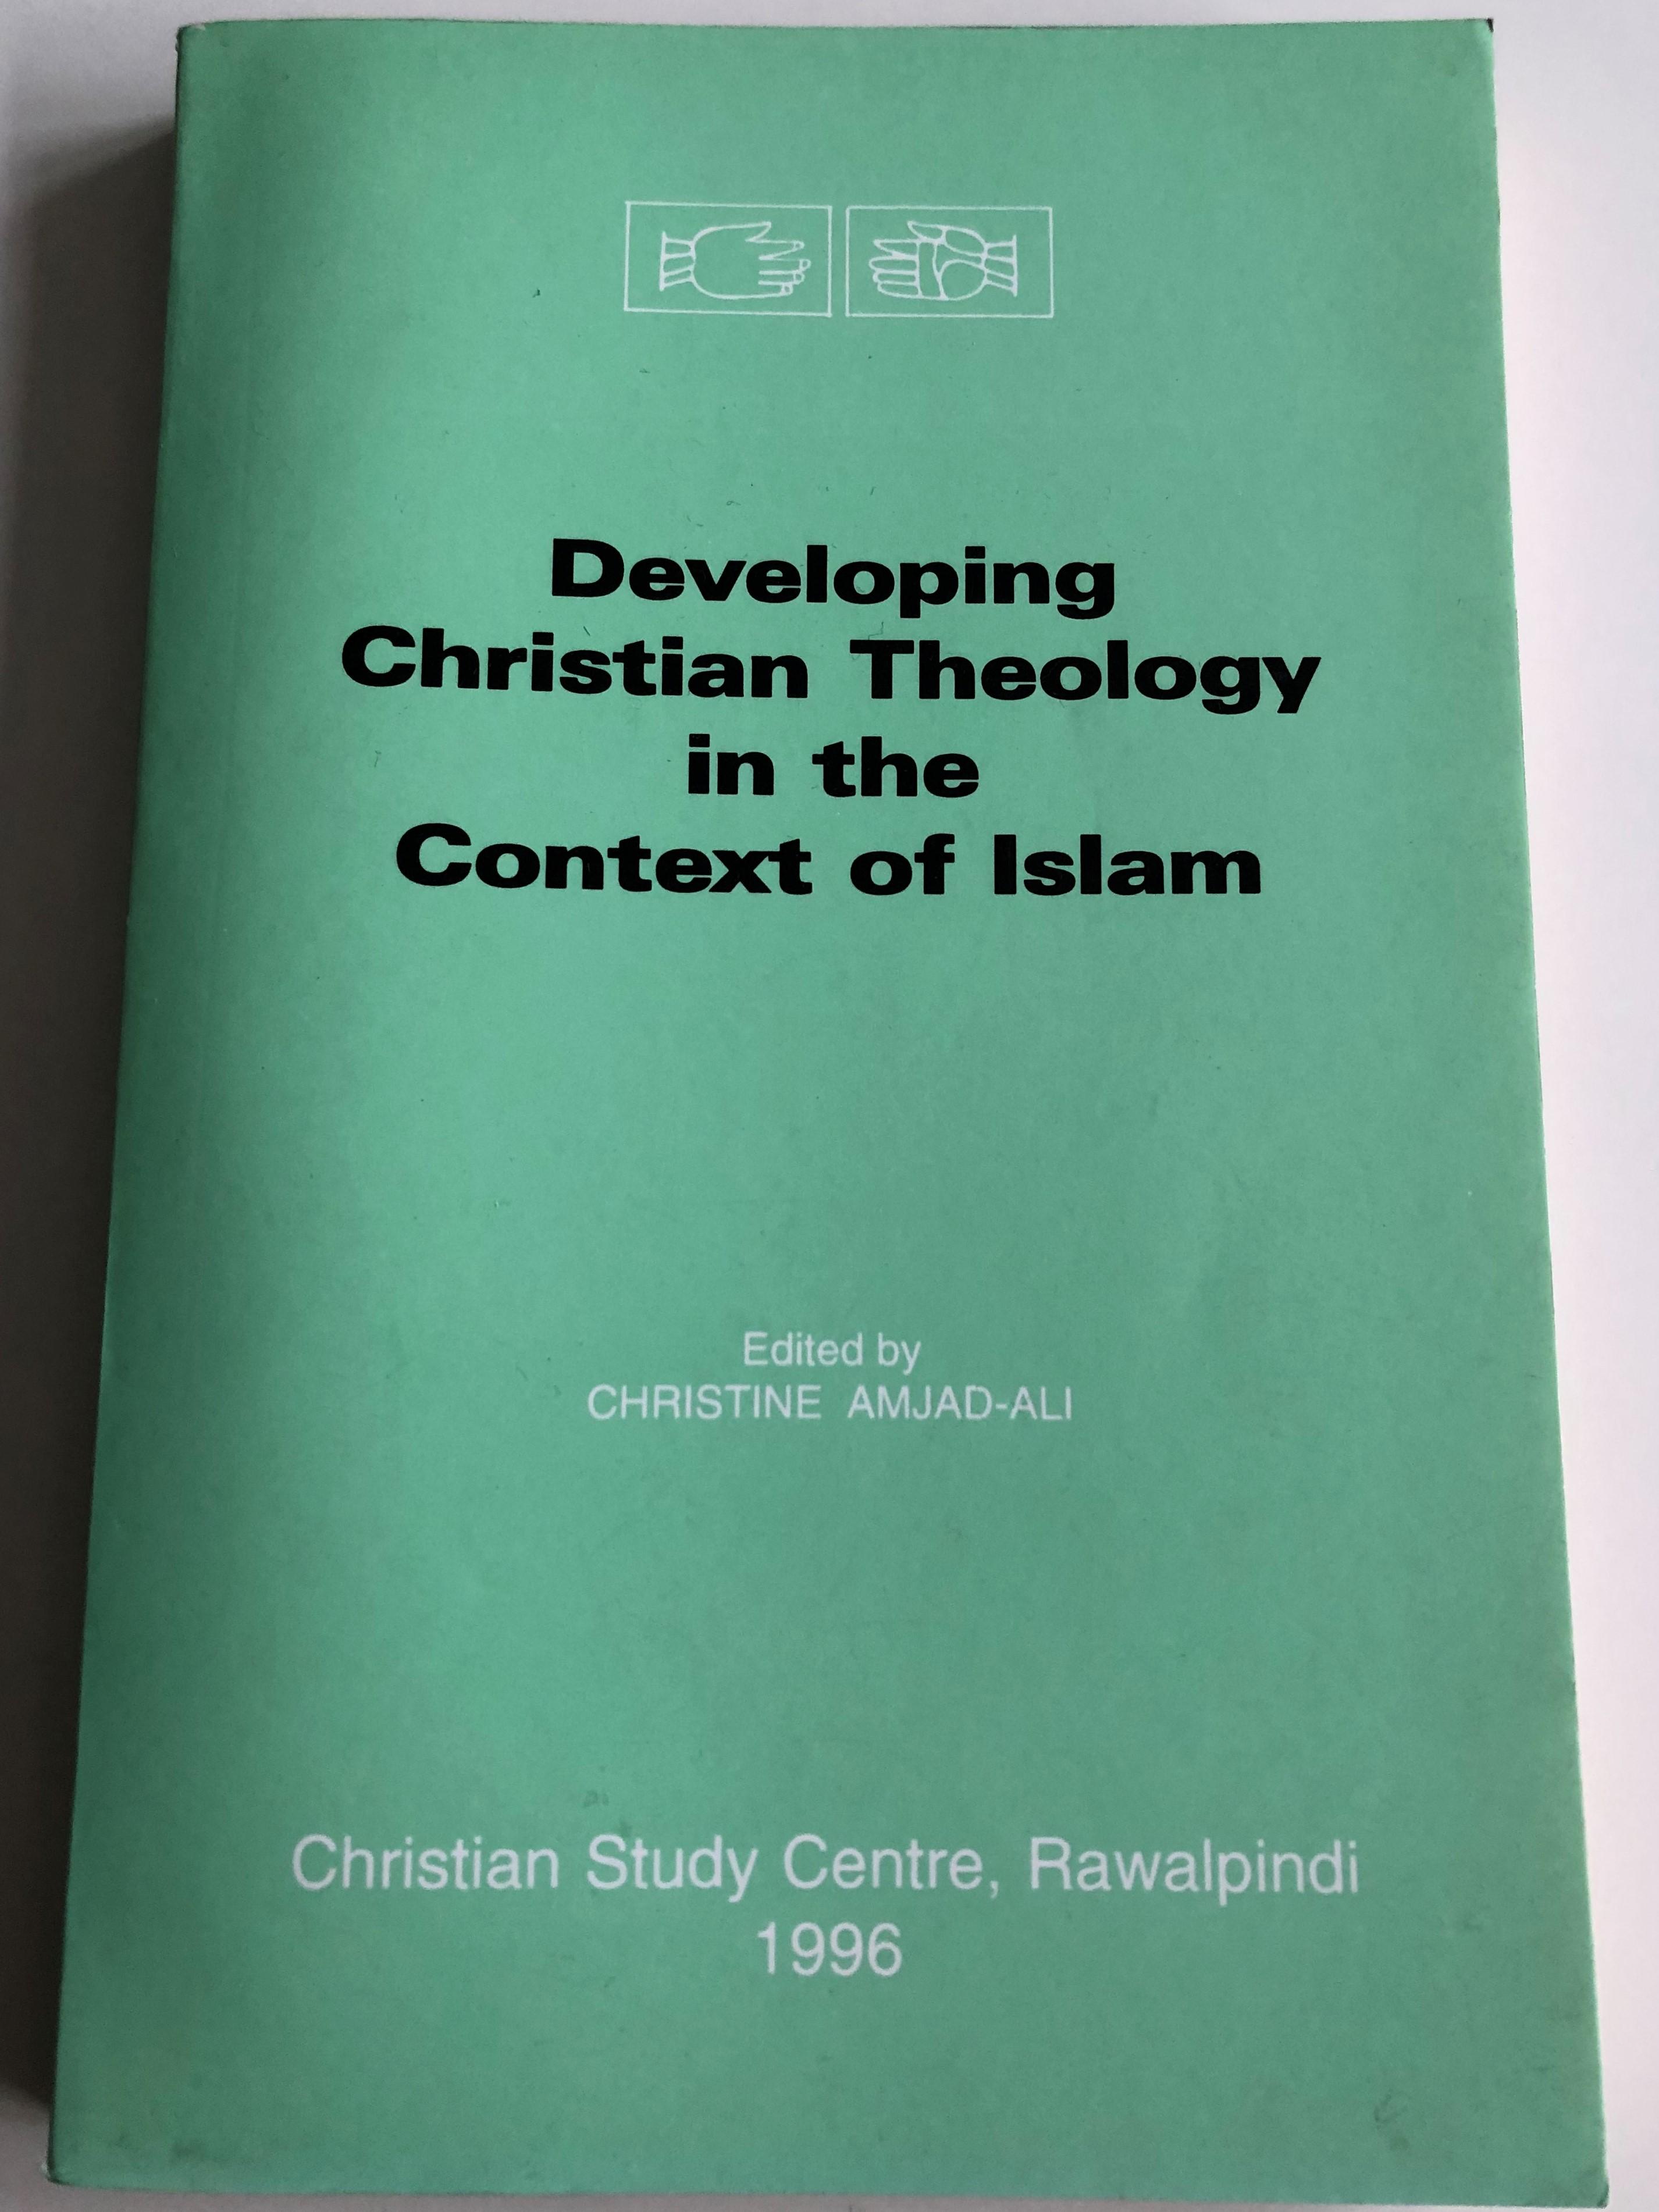 developing-christian-theology-in-the-context-of-islam-by-christine-amjad-ali-christian-study-centre-rawalpindi-1996-1-.jpg